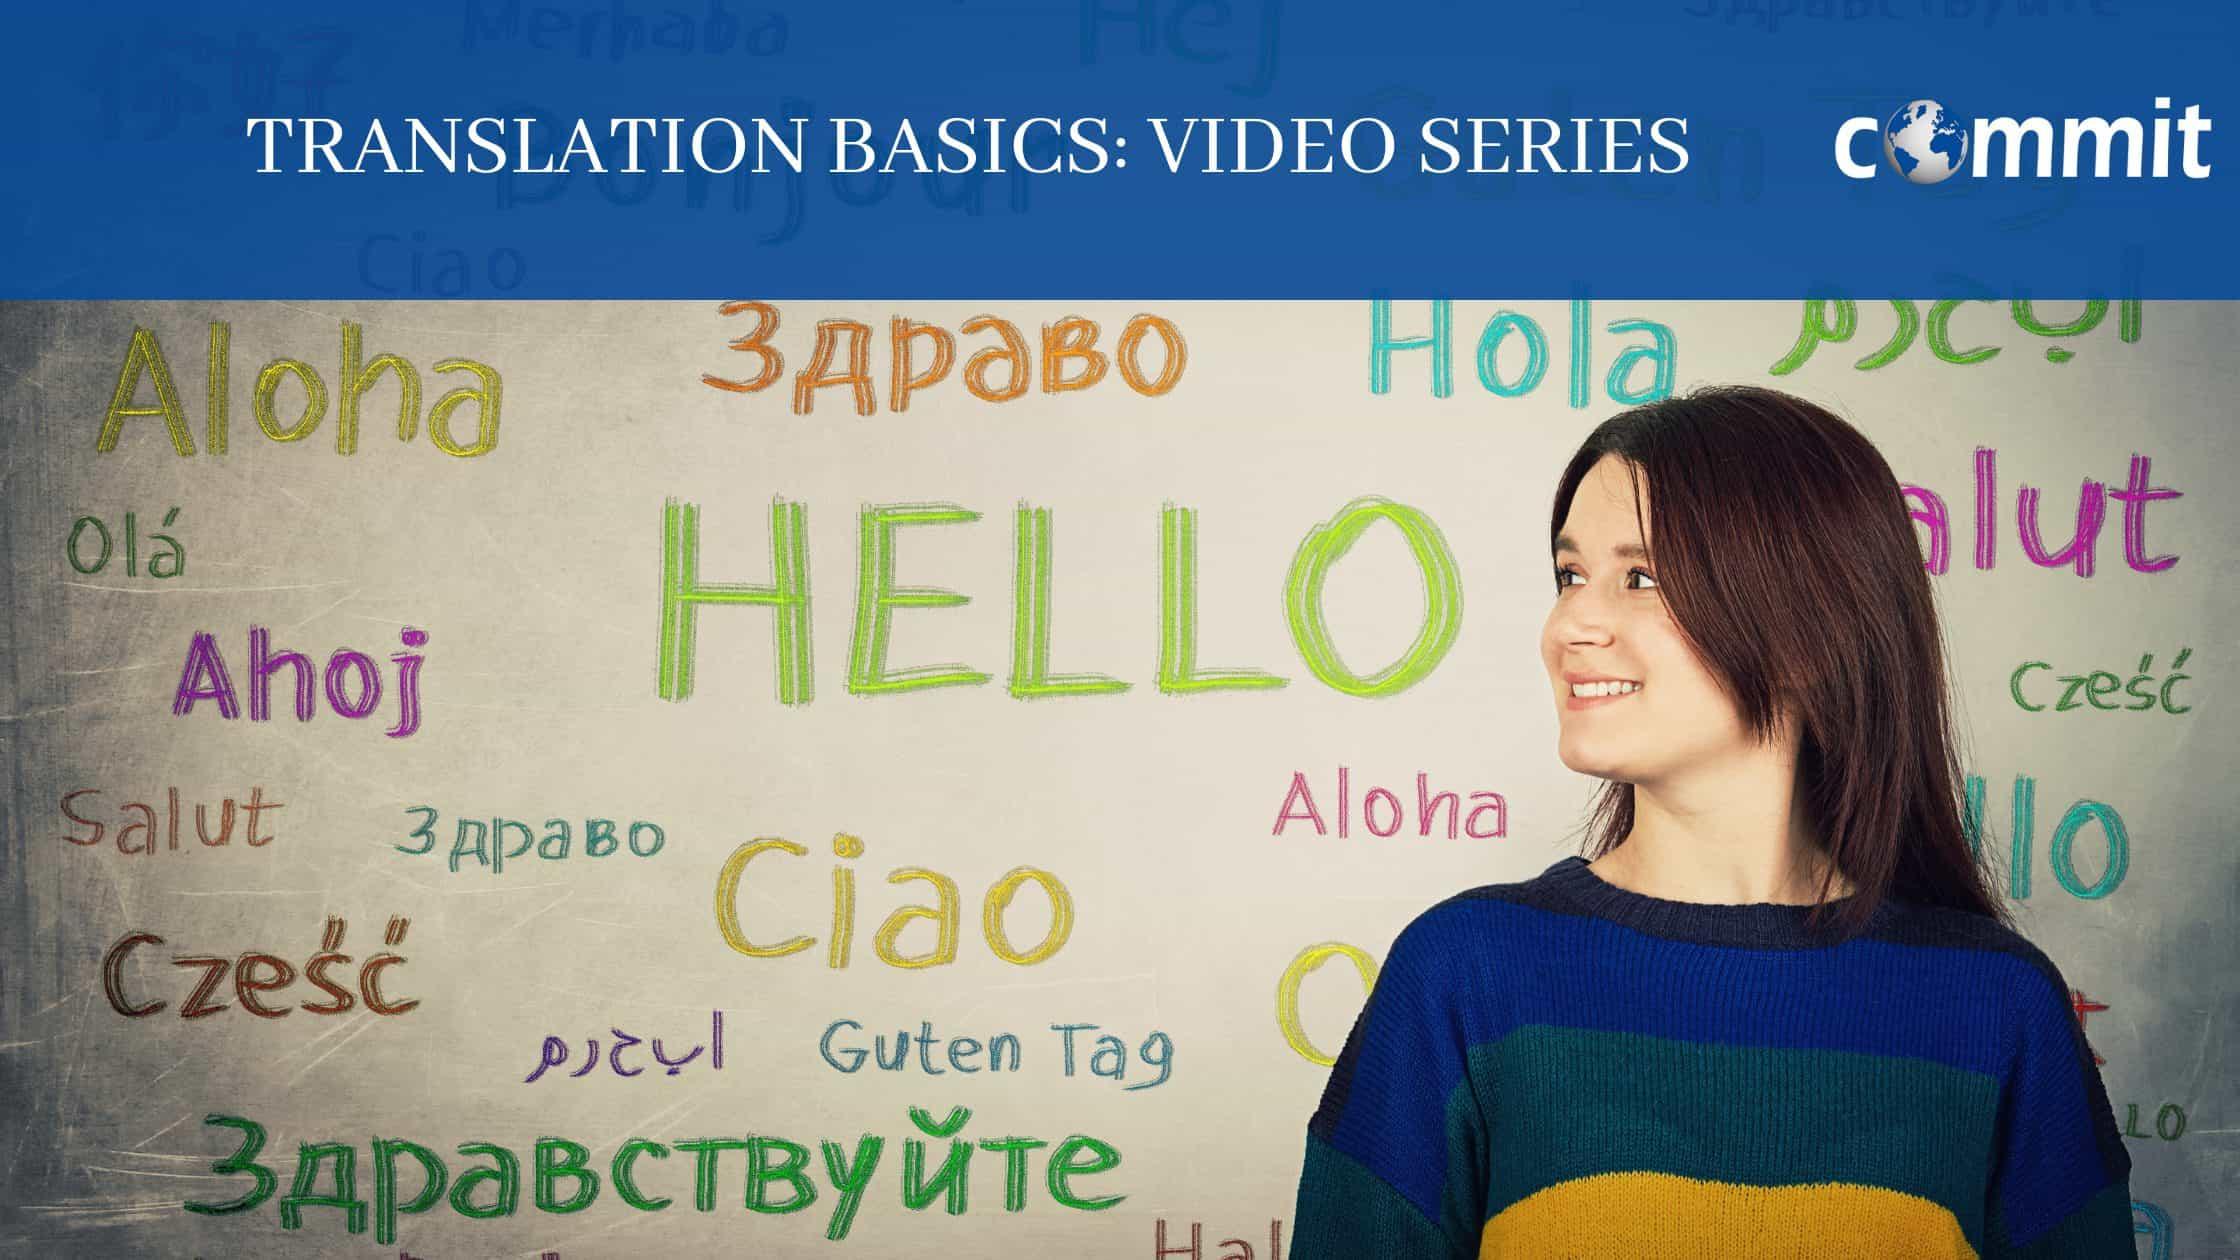 Translation Basics (Video Series)